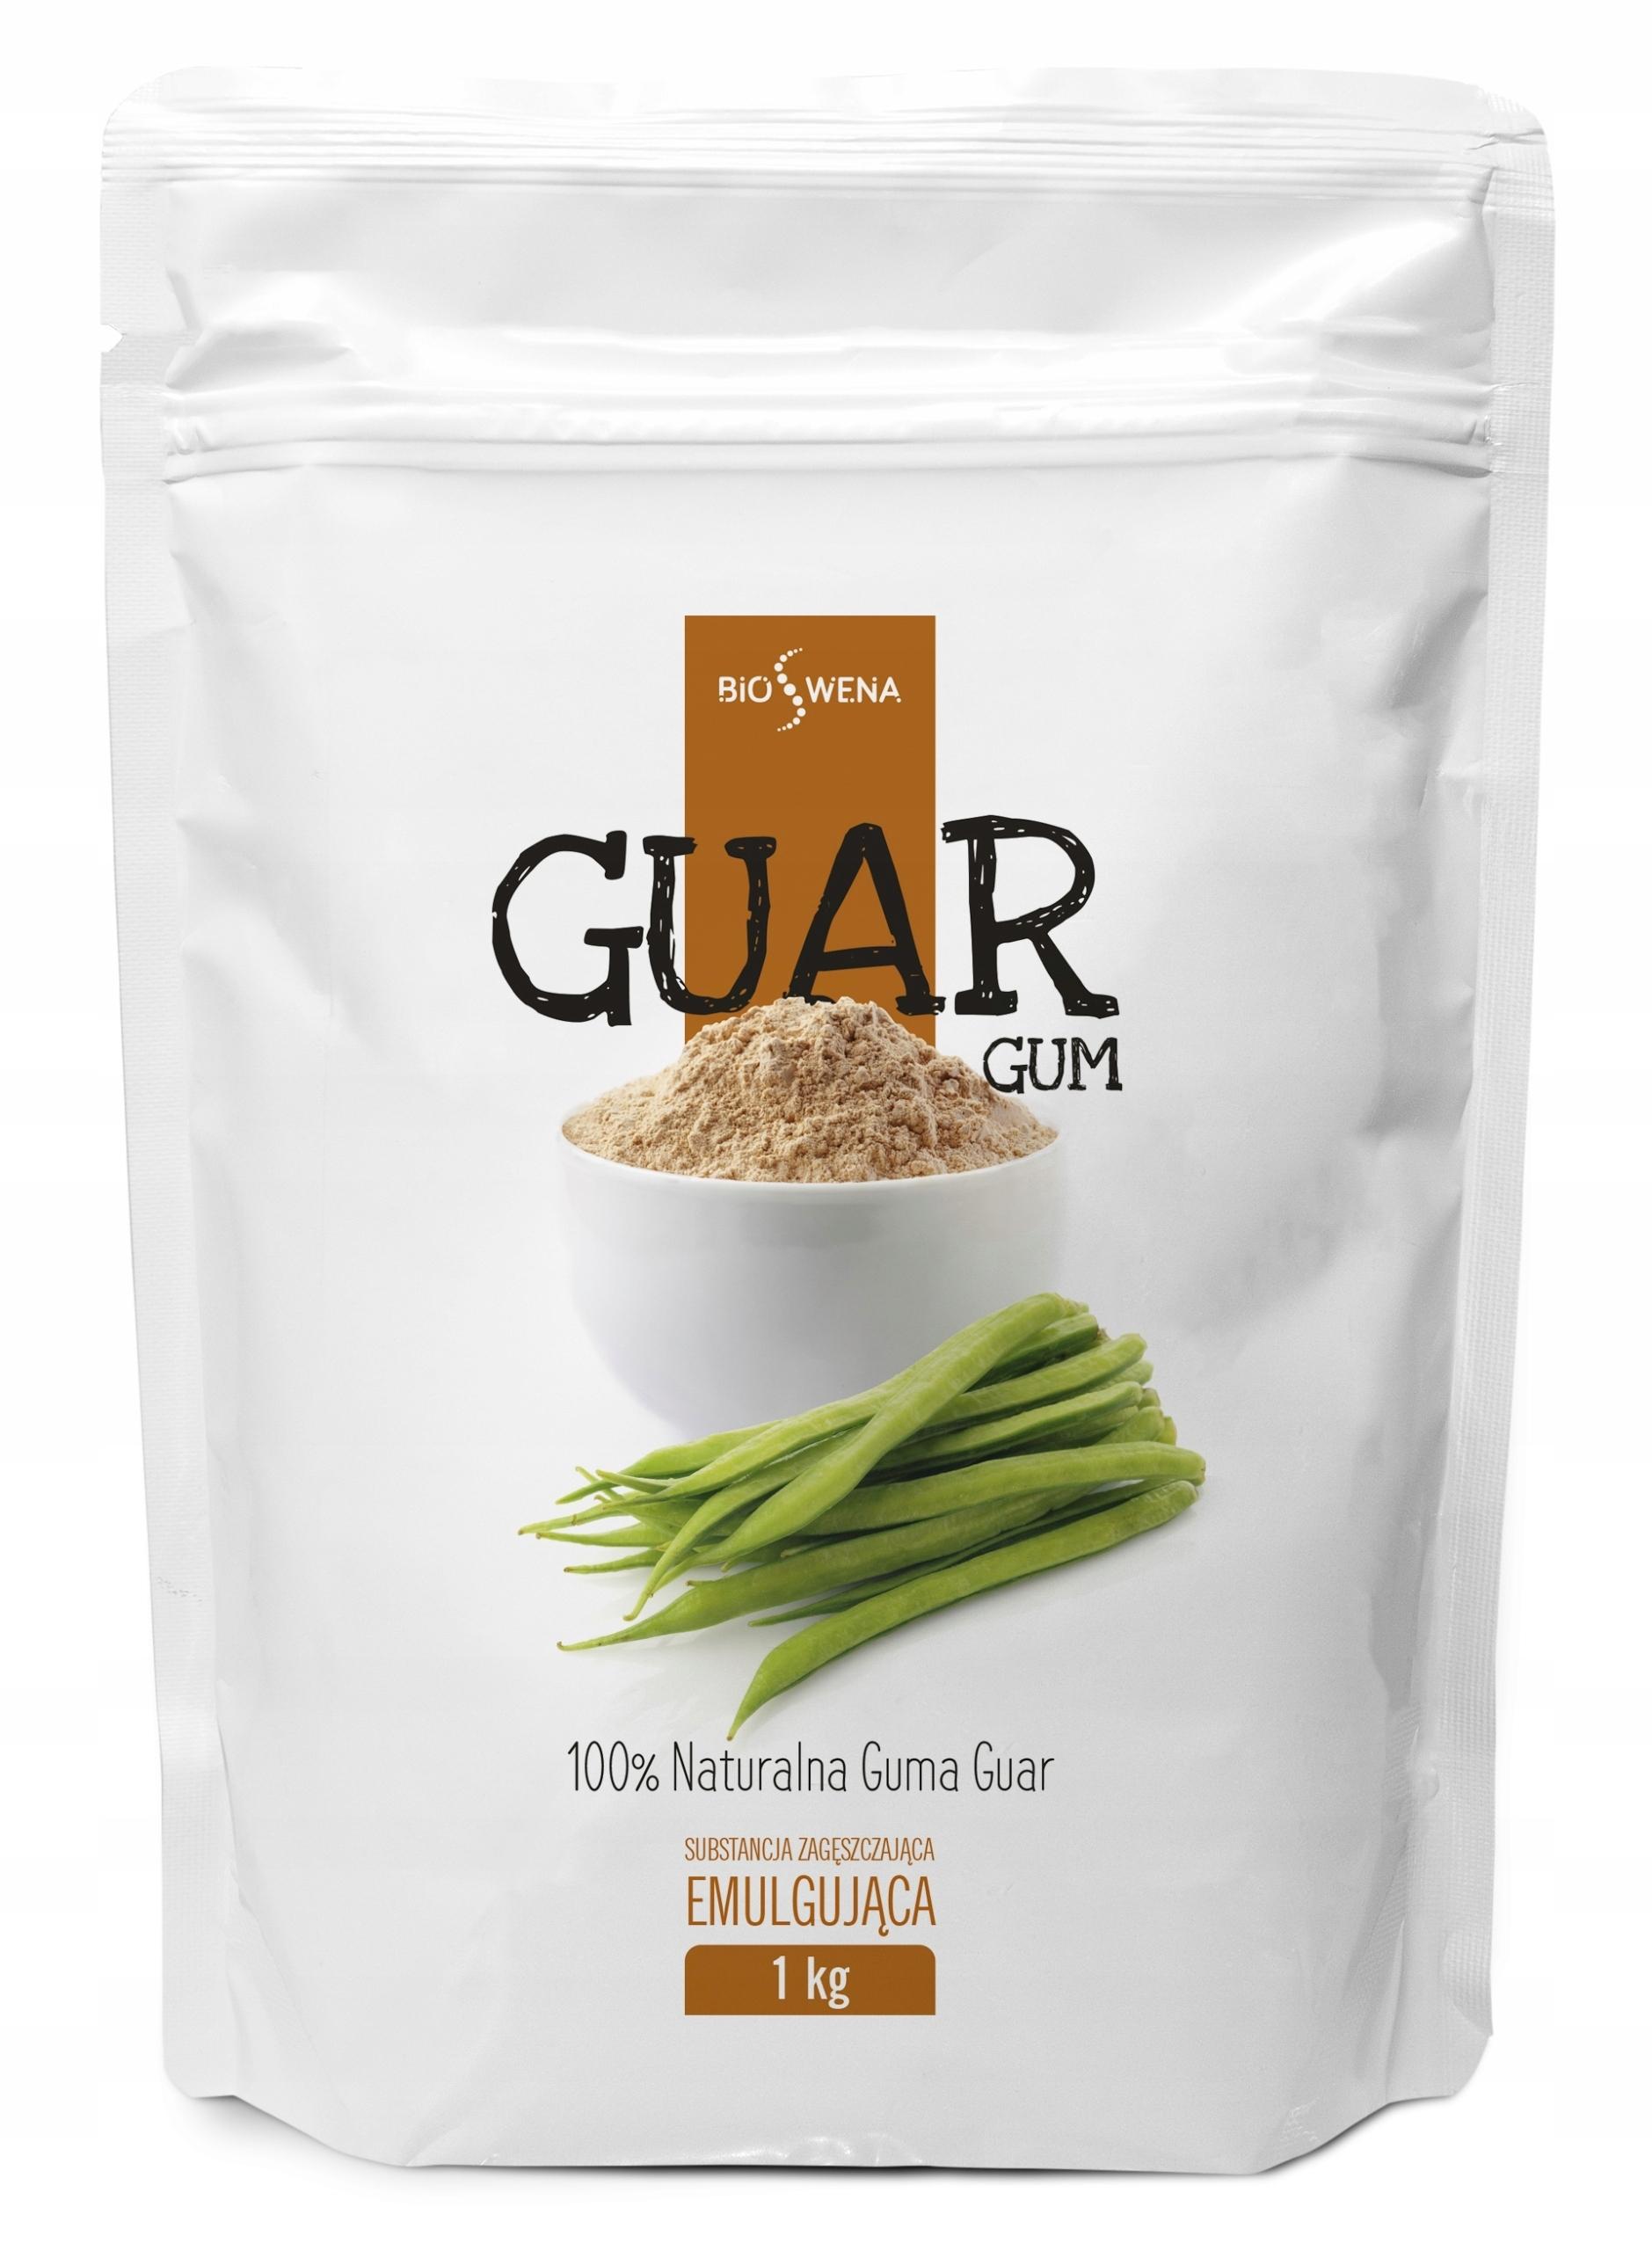 GUMA GUAR 1kg / Naturalna, czysta MOCNA / BIOSWENA